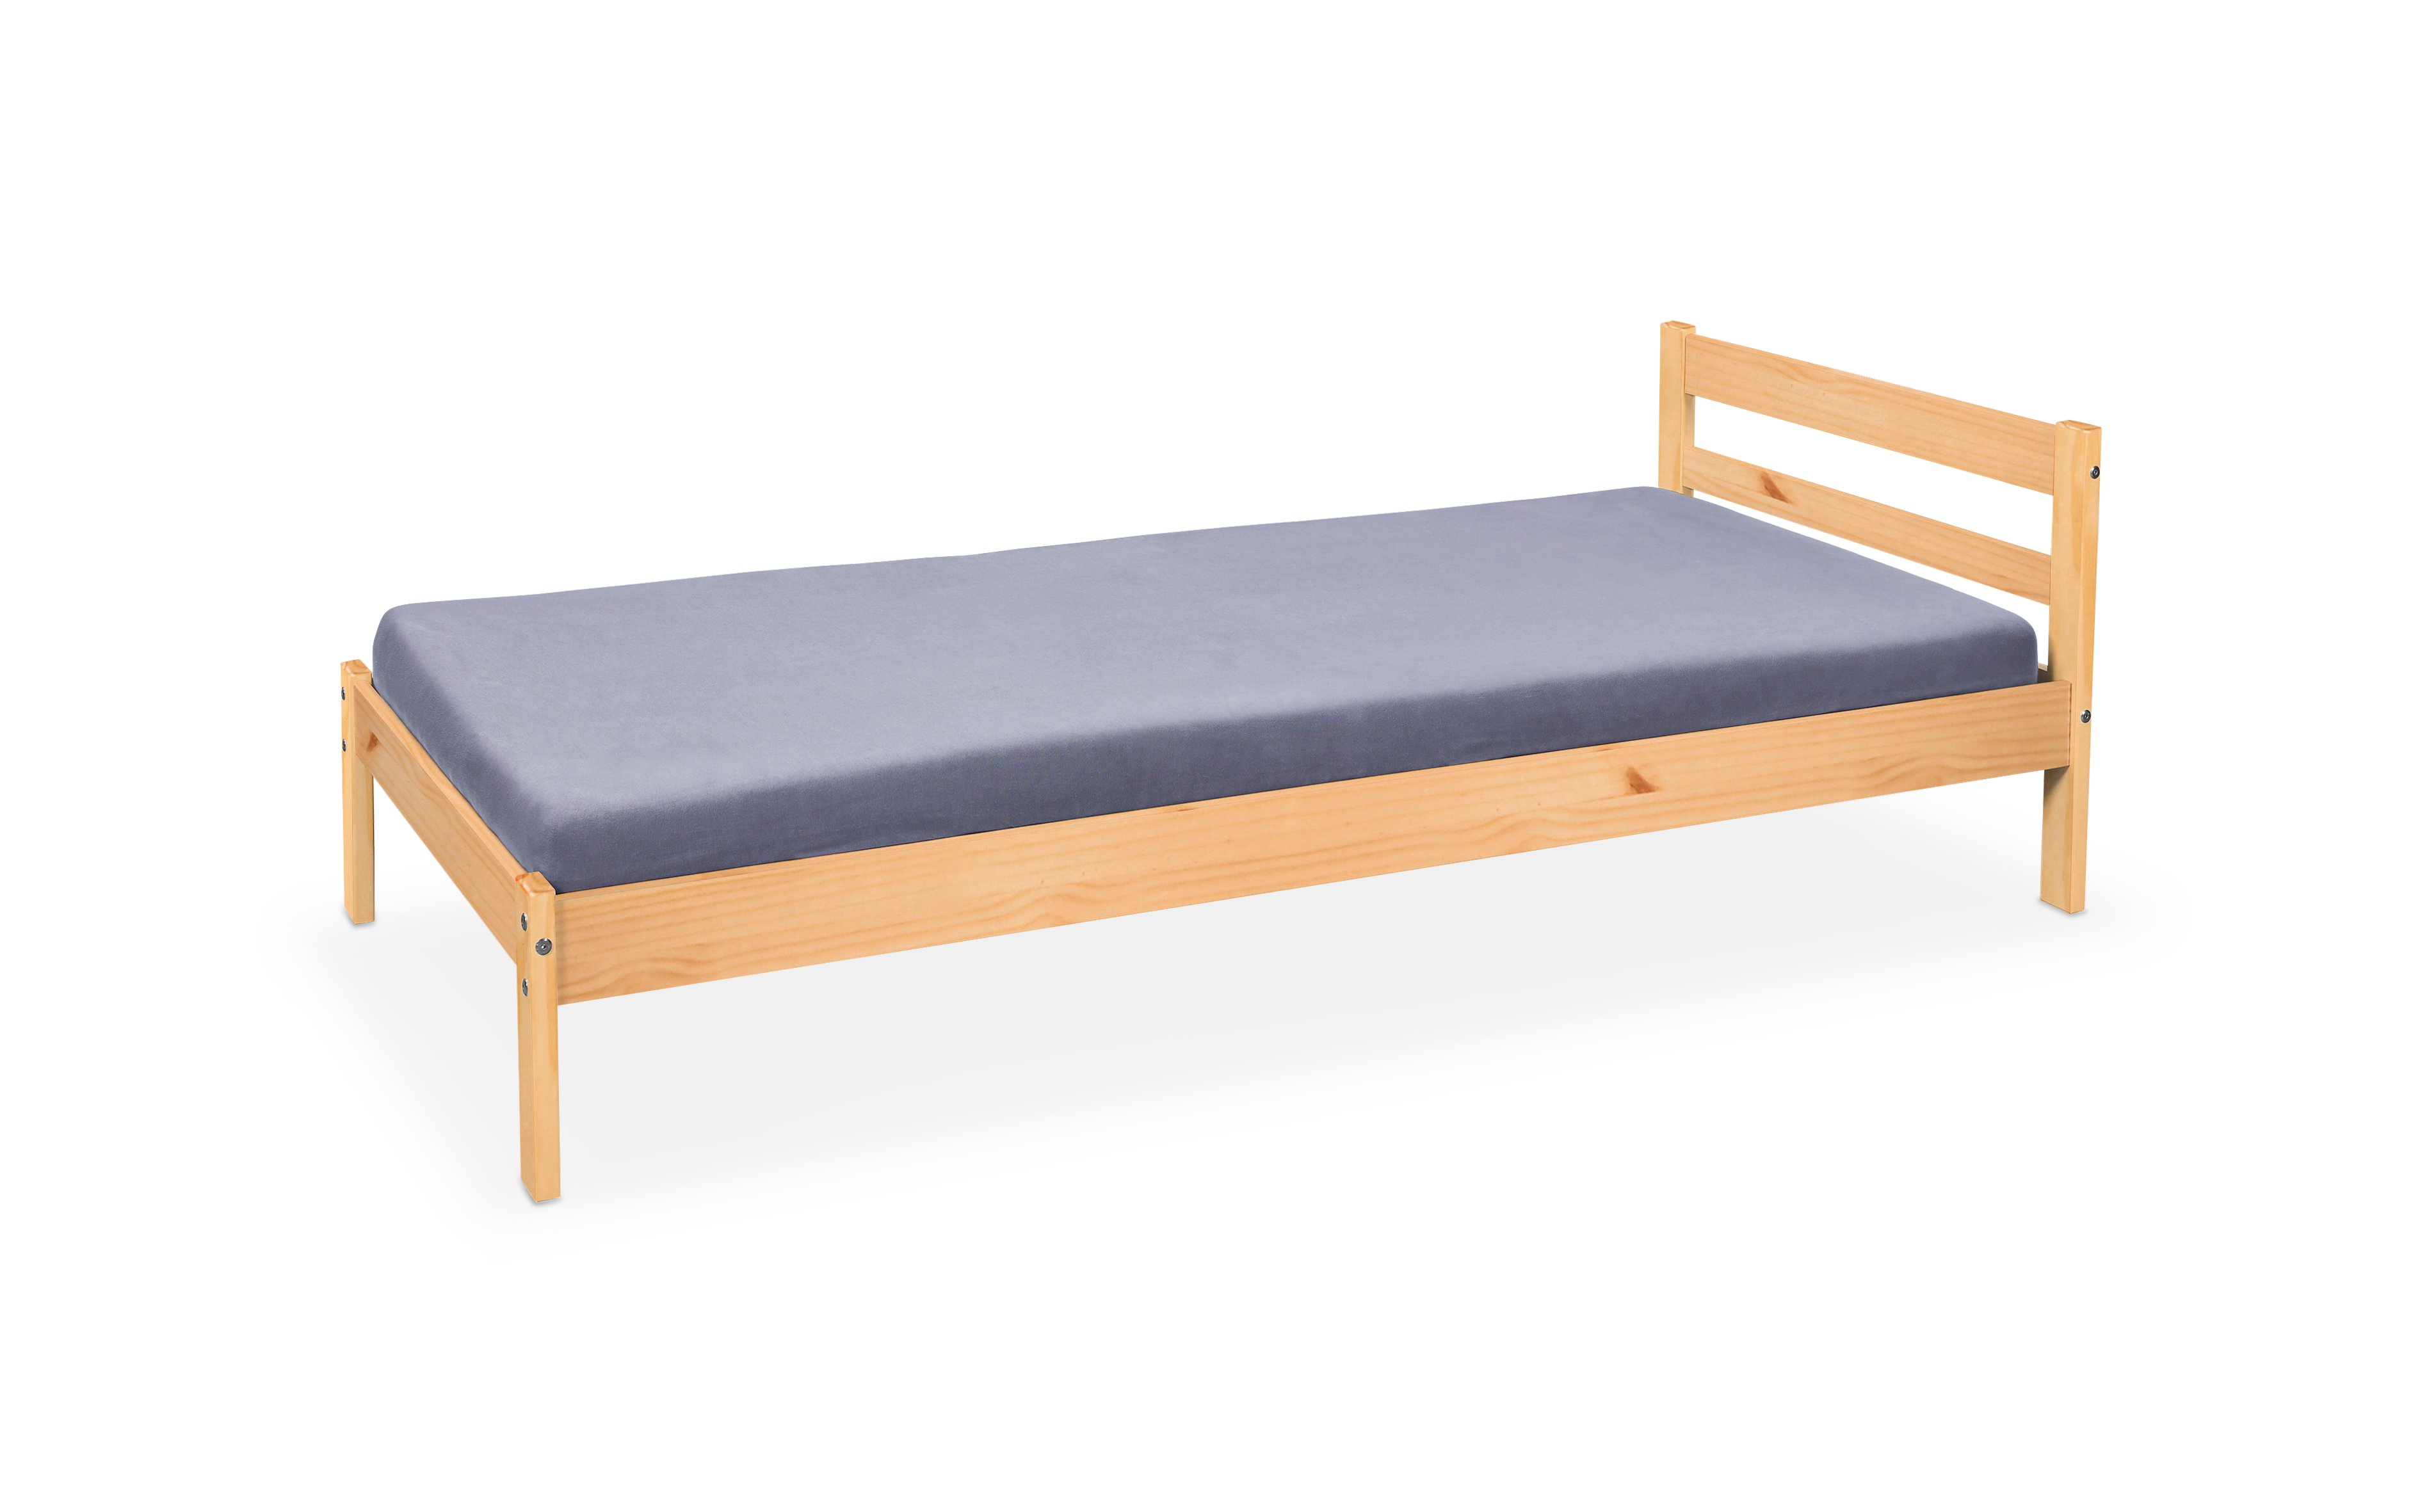 Jednolůžková postel 90 cm - Halmar - Finy (borovice)